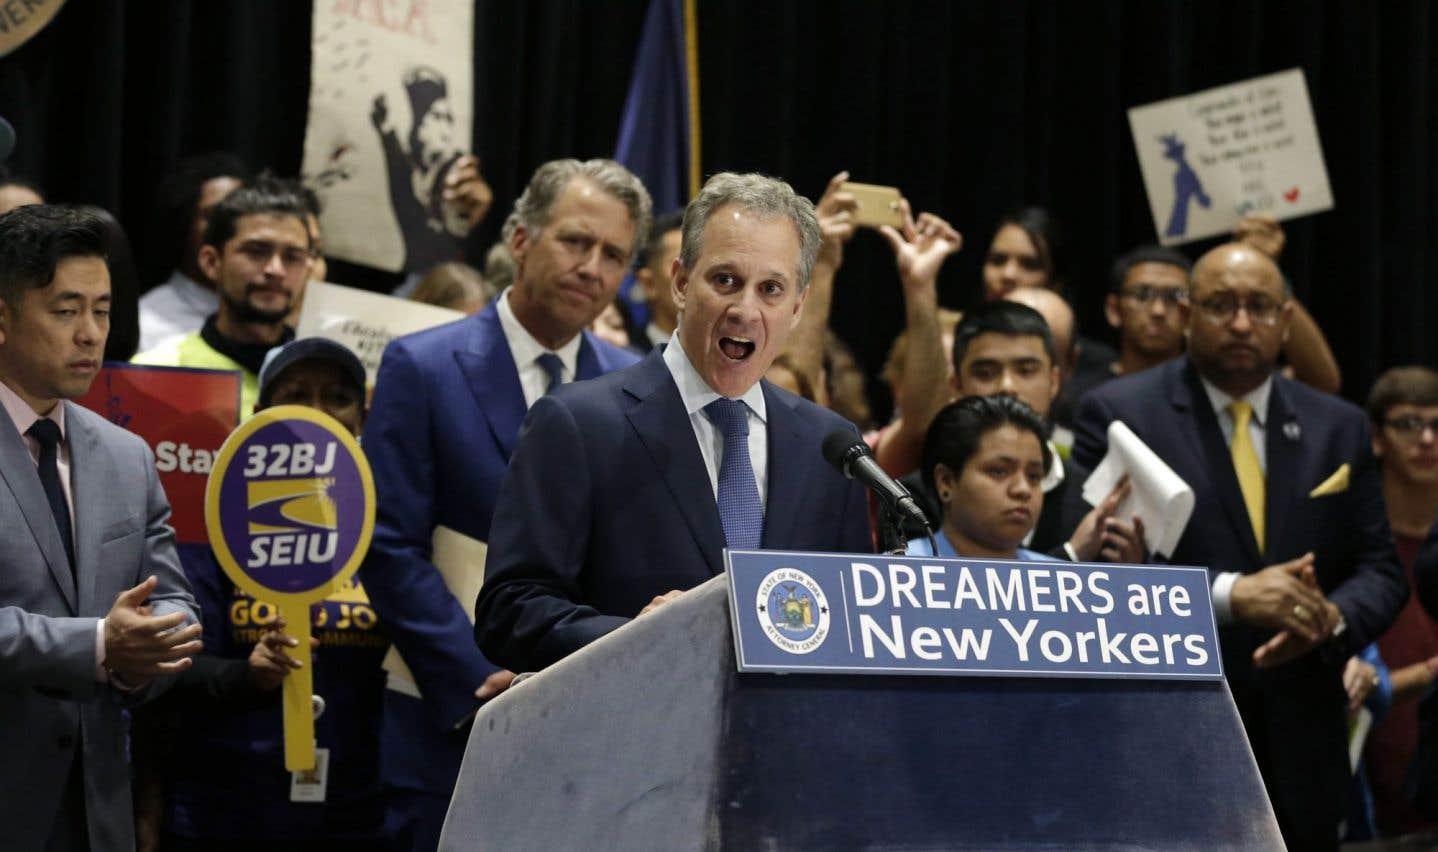 15 États contestent la fin du programme des «Dreamers»